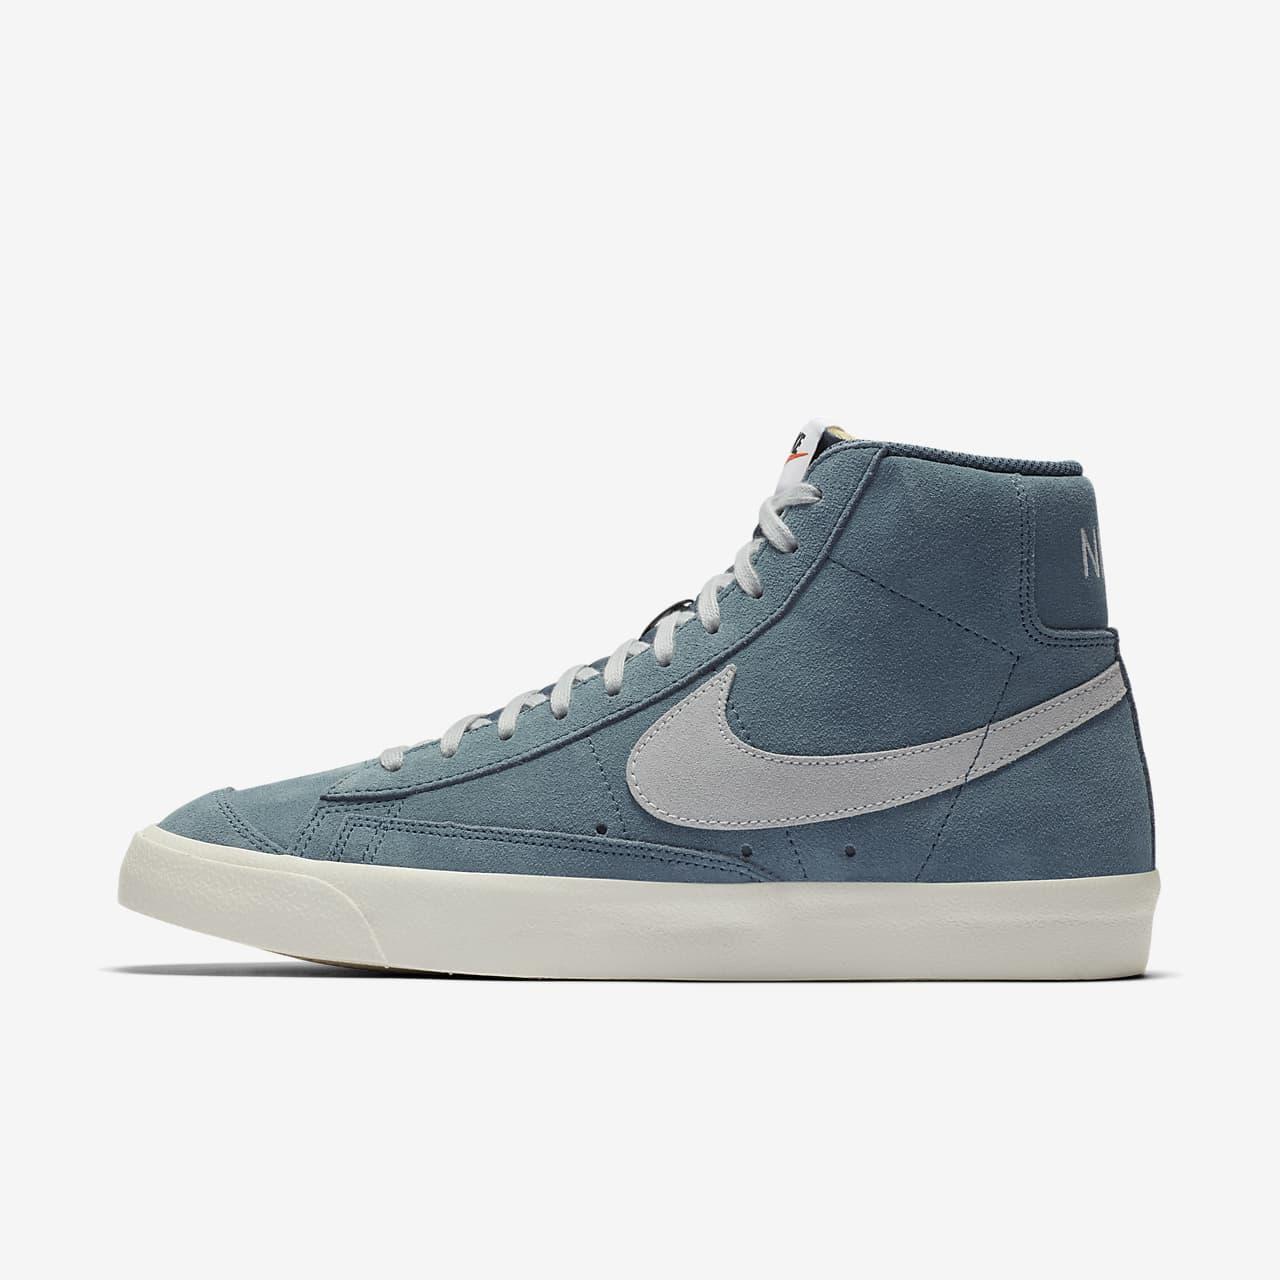 Nike Blazer Mid '77 Suede Shoe. Nike NL